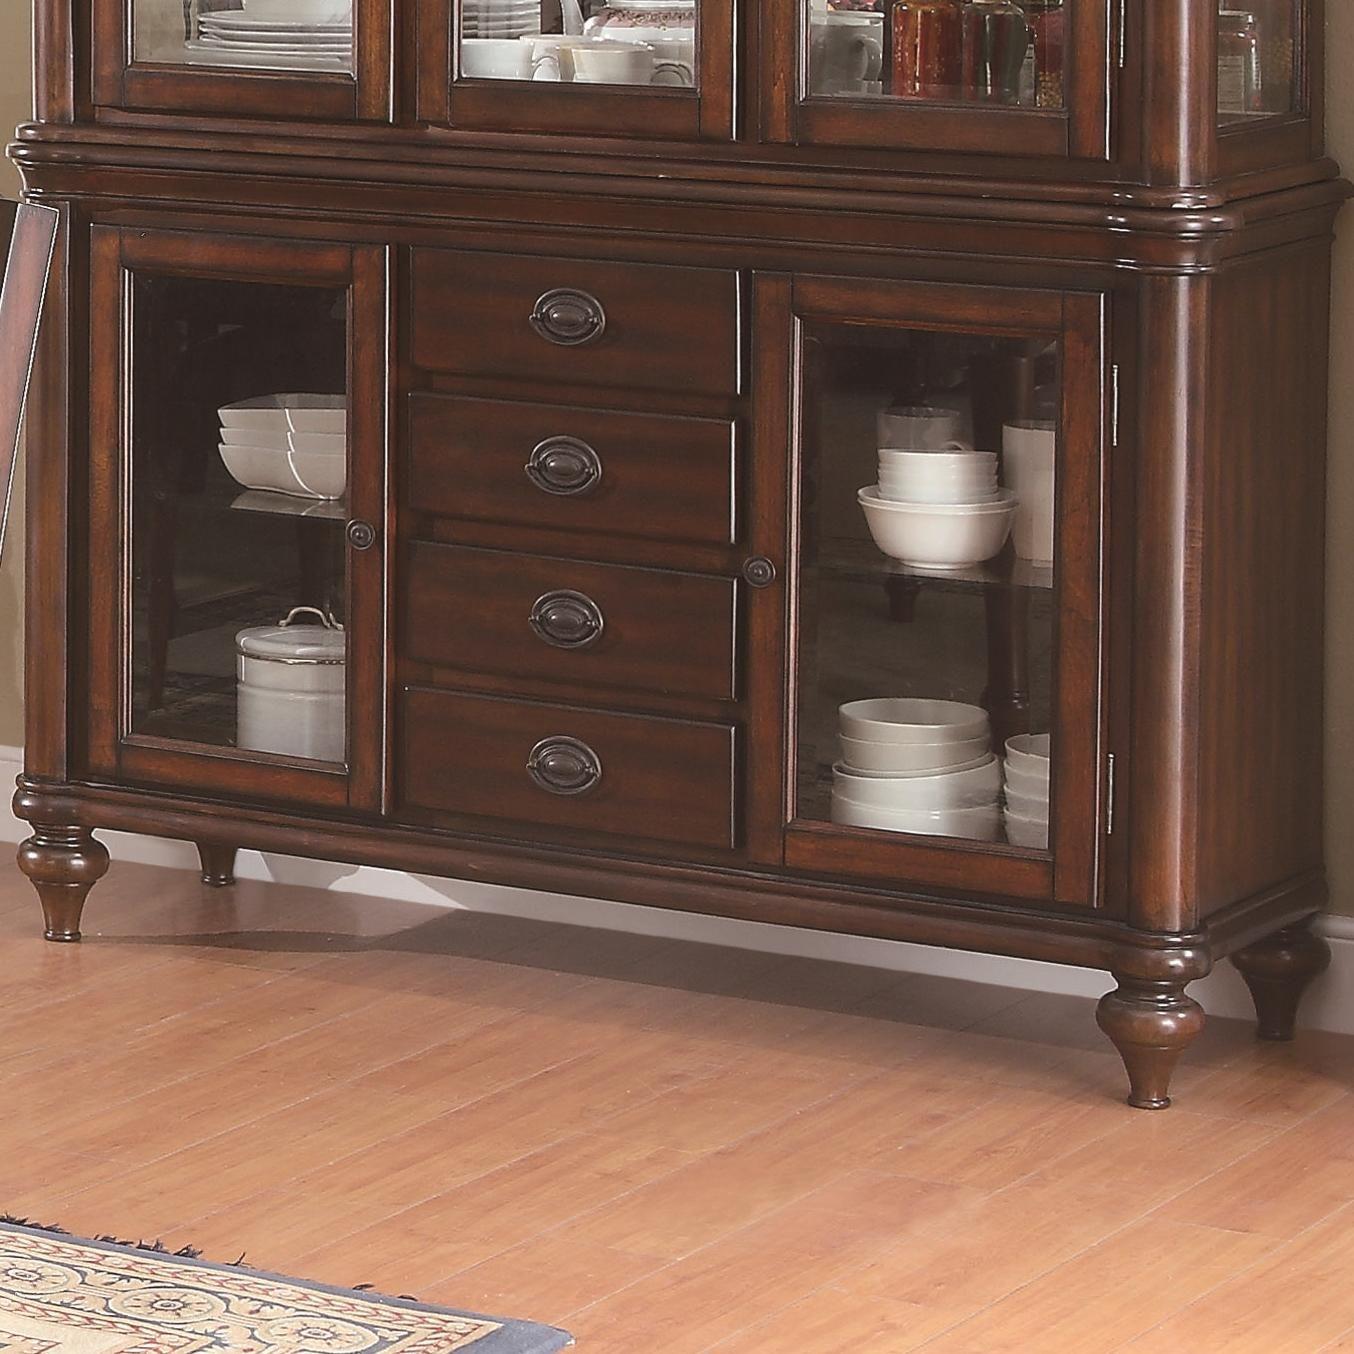 Anson Buffet Only By Coaster Nebraska Furniture Mart Furniture China Cabinet